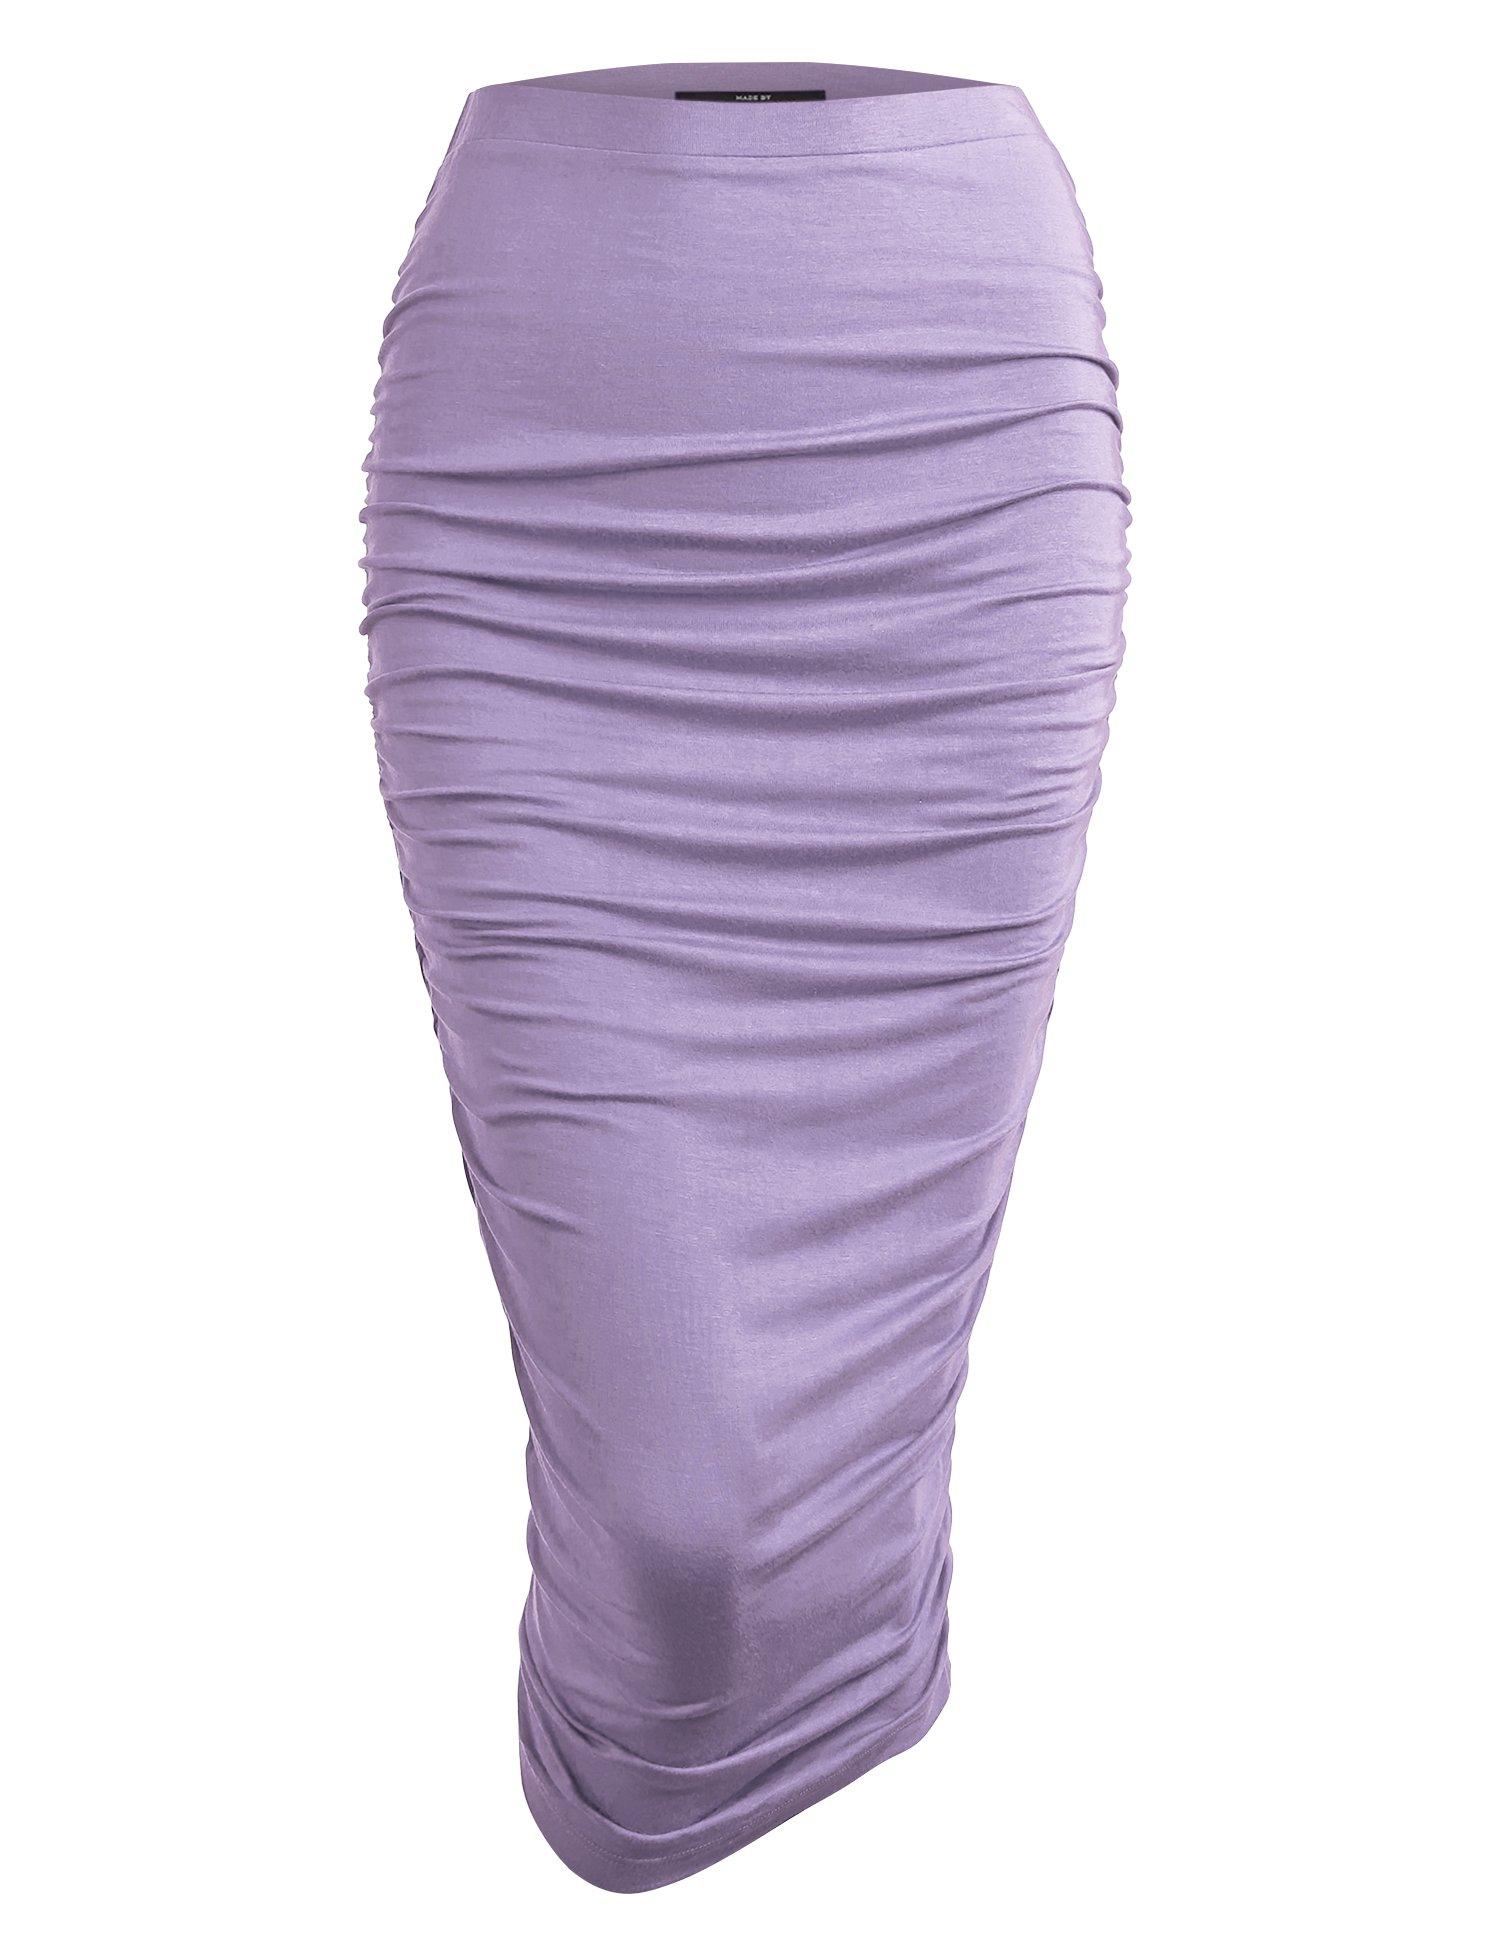 Made By Johnny WB1147 Womens Elegant High Waist Pencil Skirt Side Shirring M Lilac